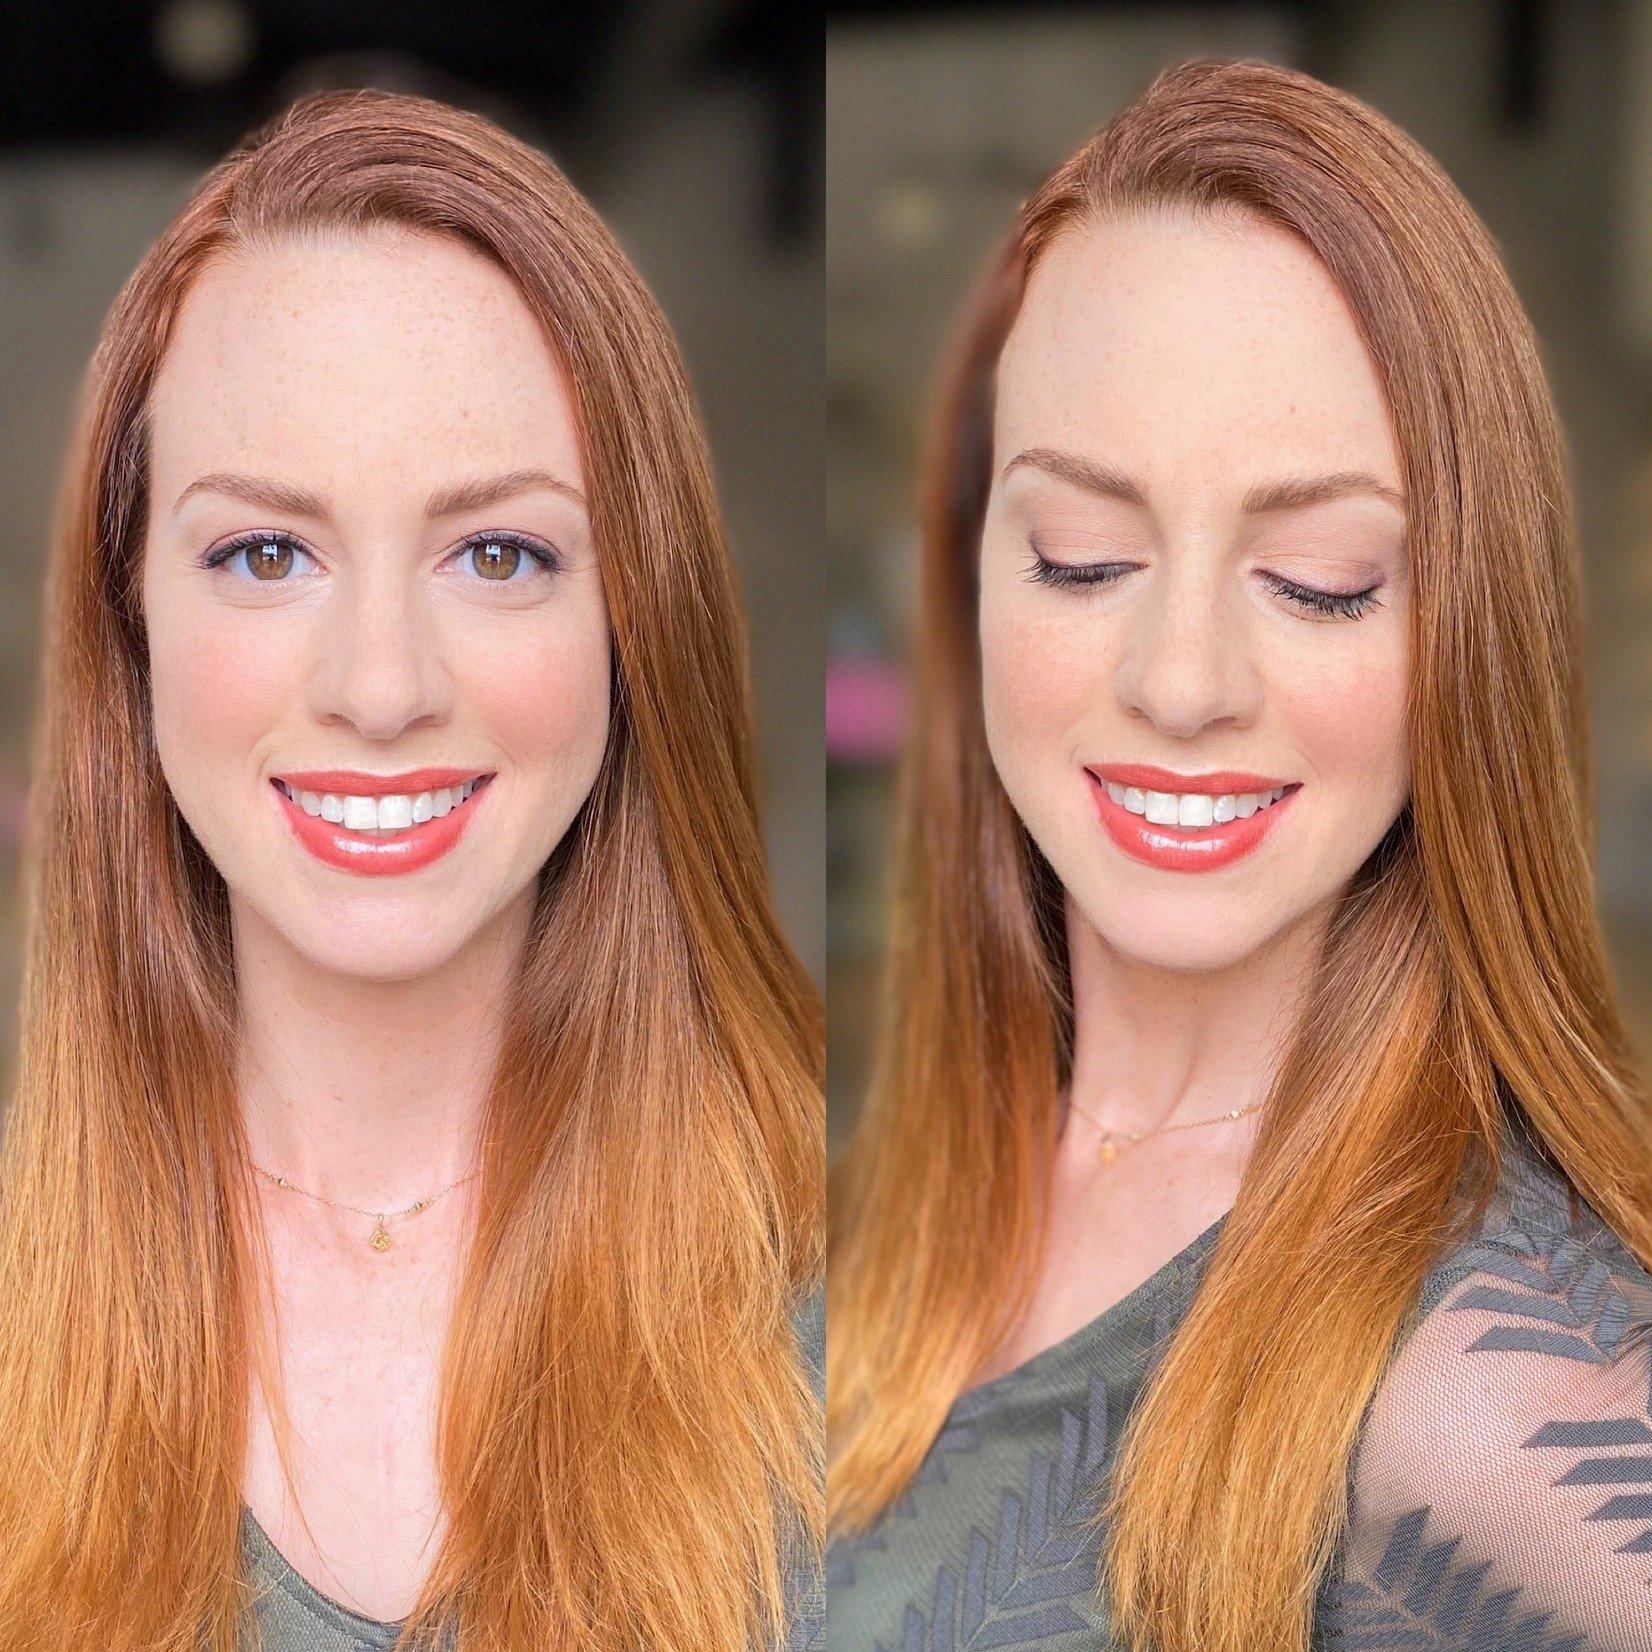 JKC SHOP BY EYE  - Auburn/Red Hair + Brown Eyes